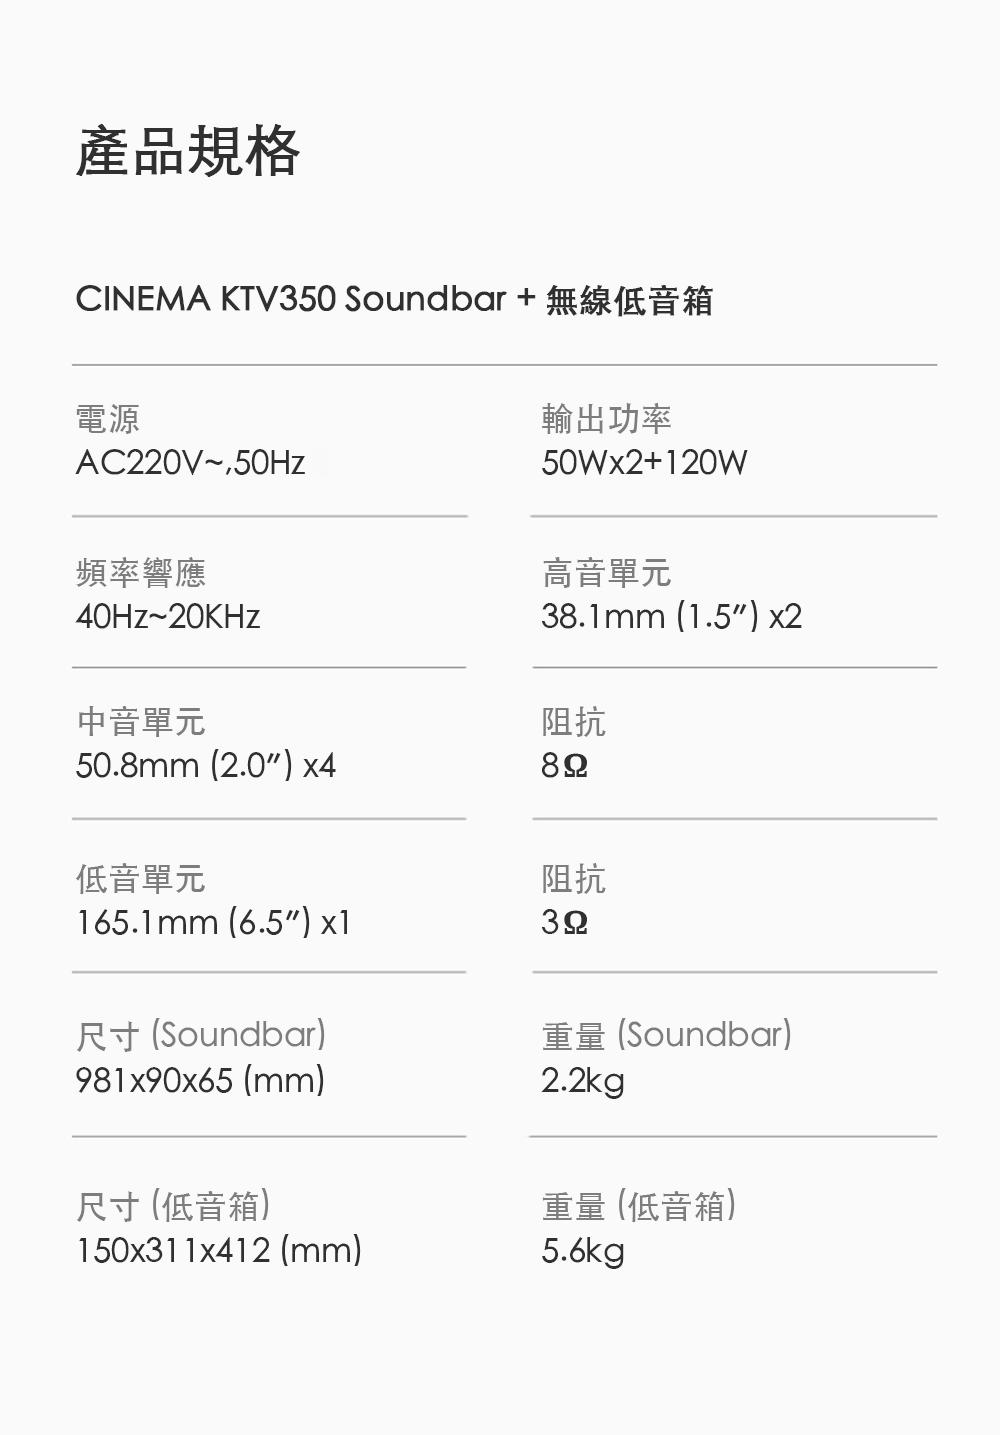 JBL-CINEMA-KTV350-Catalogue-(繁體中文)11.png